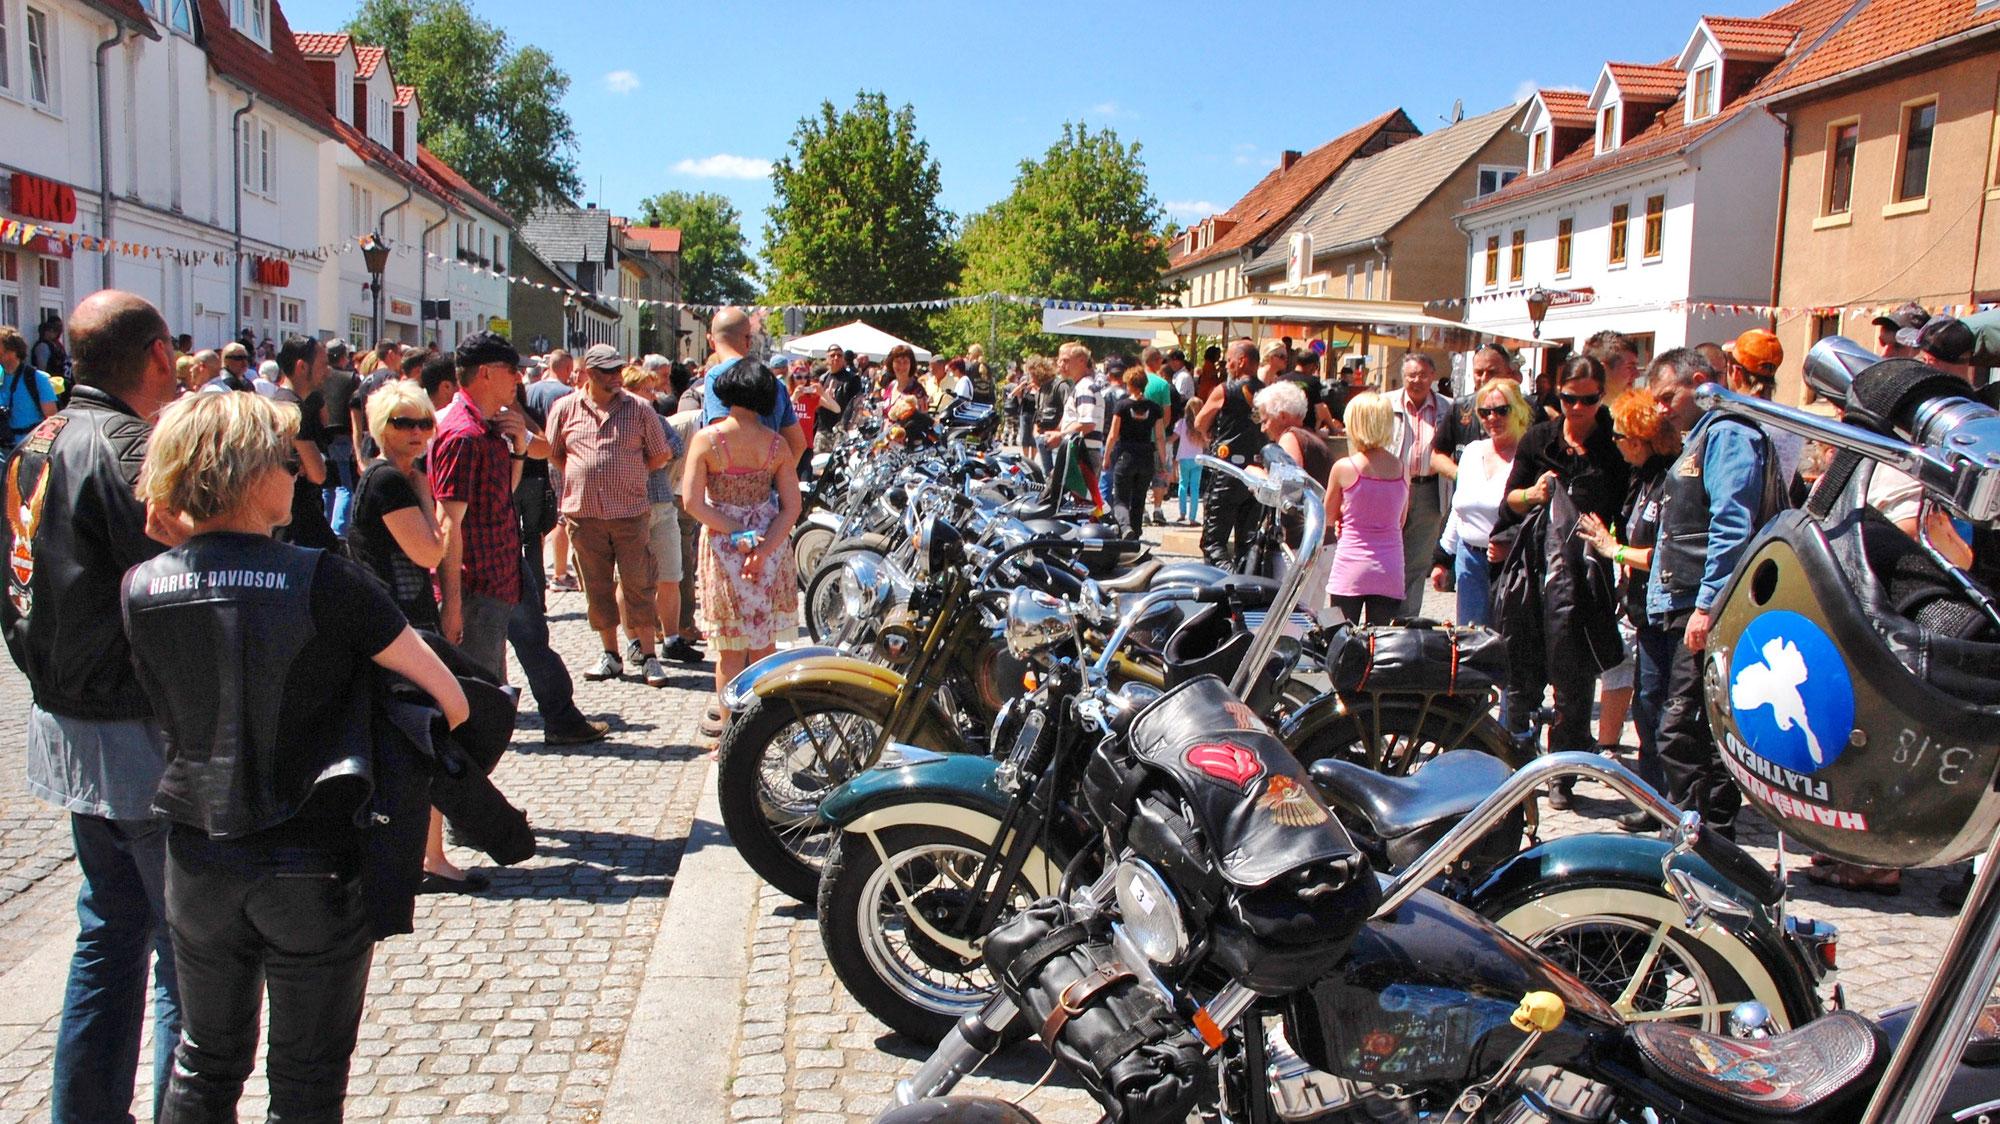 Tourismusstandort Sachsen-Anhalt soll angekurbelt werden